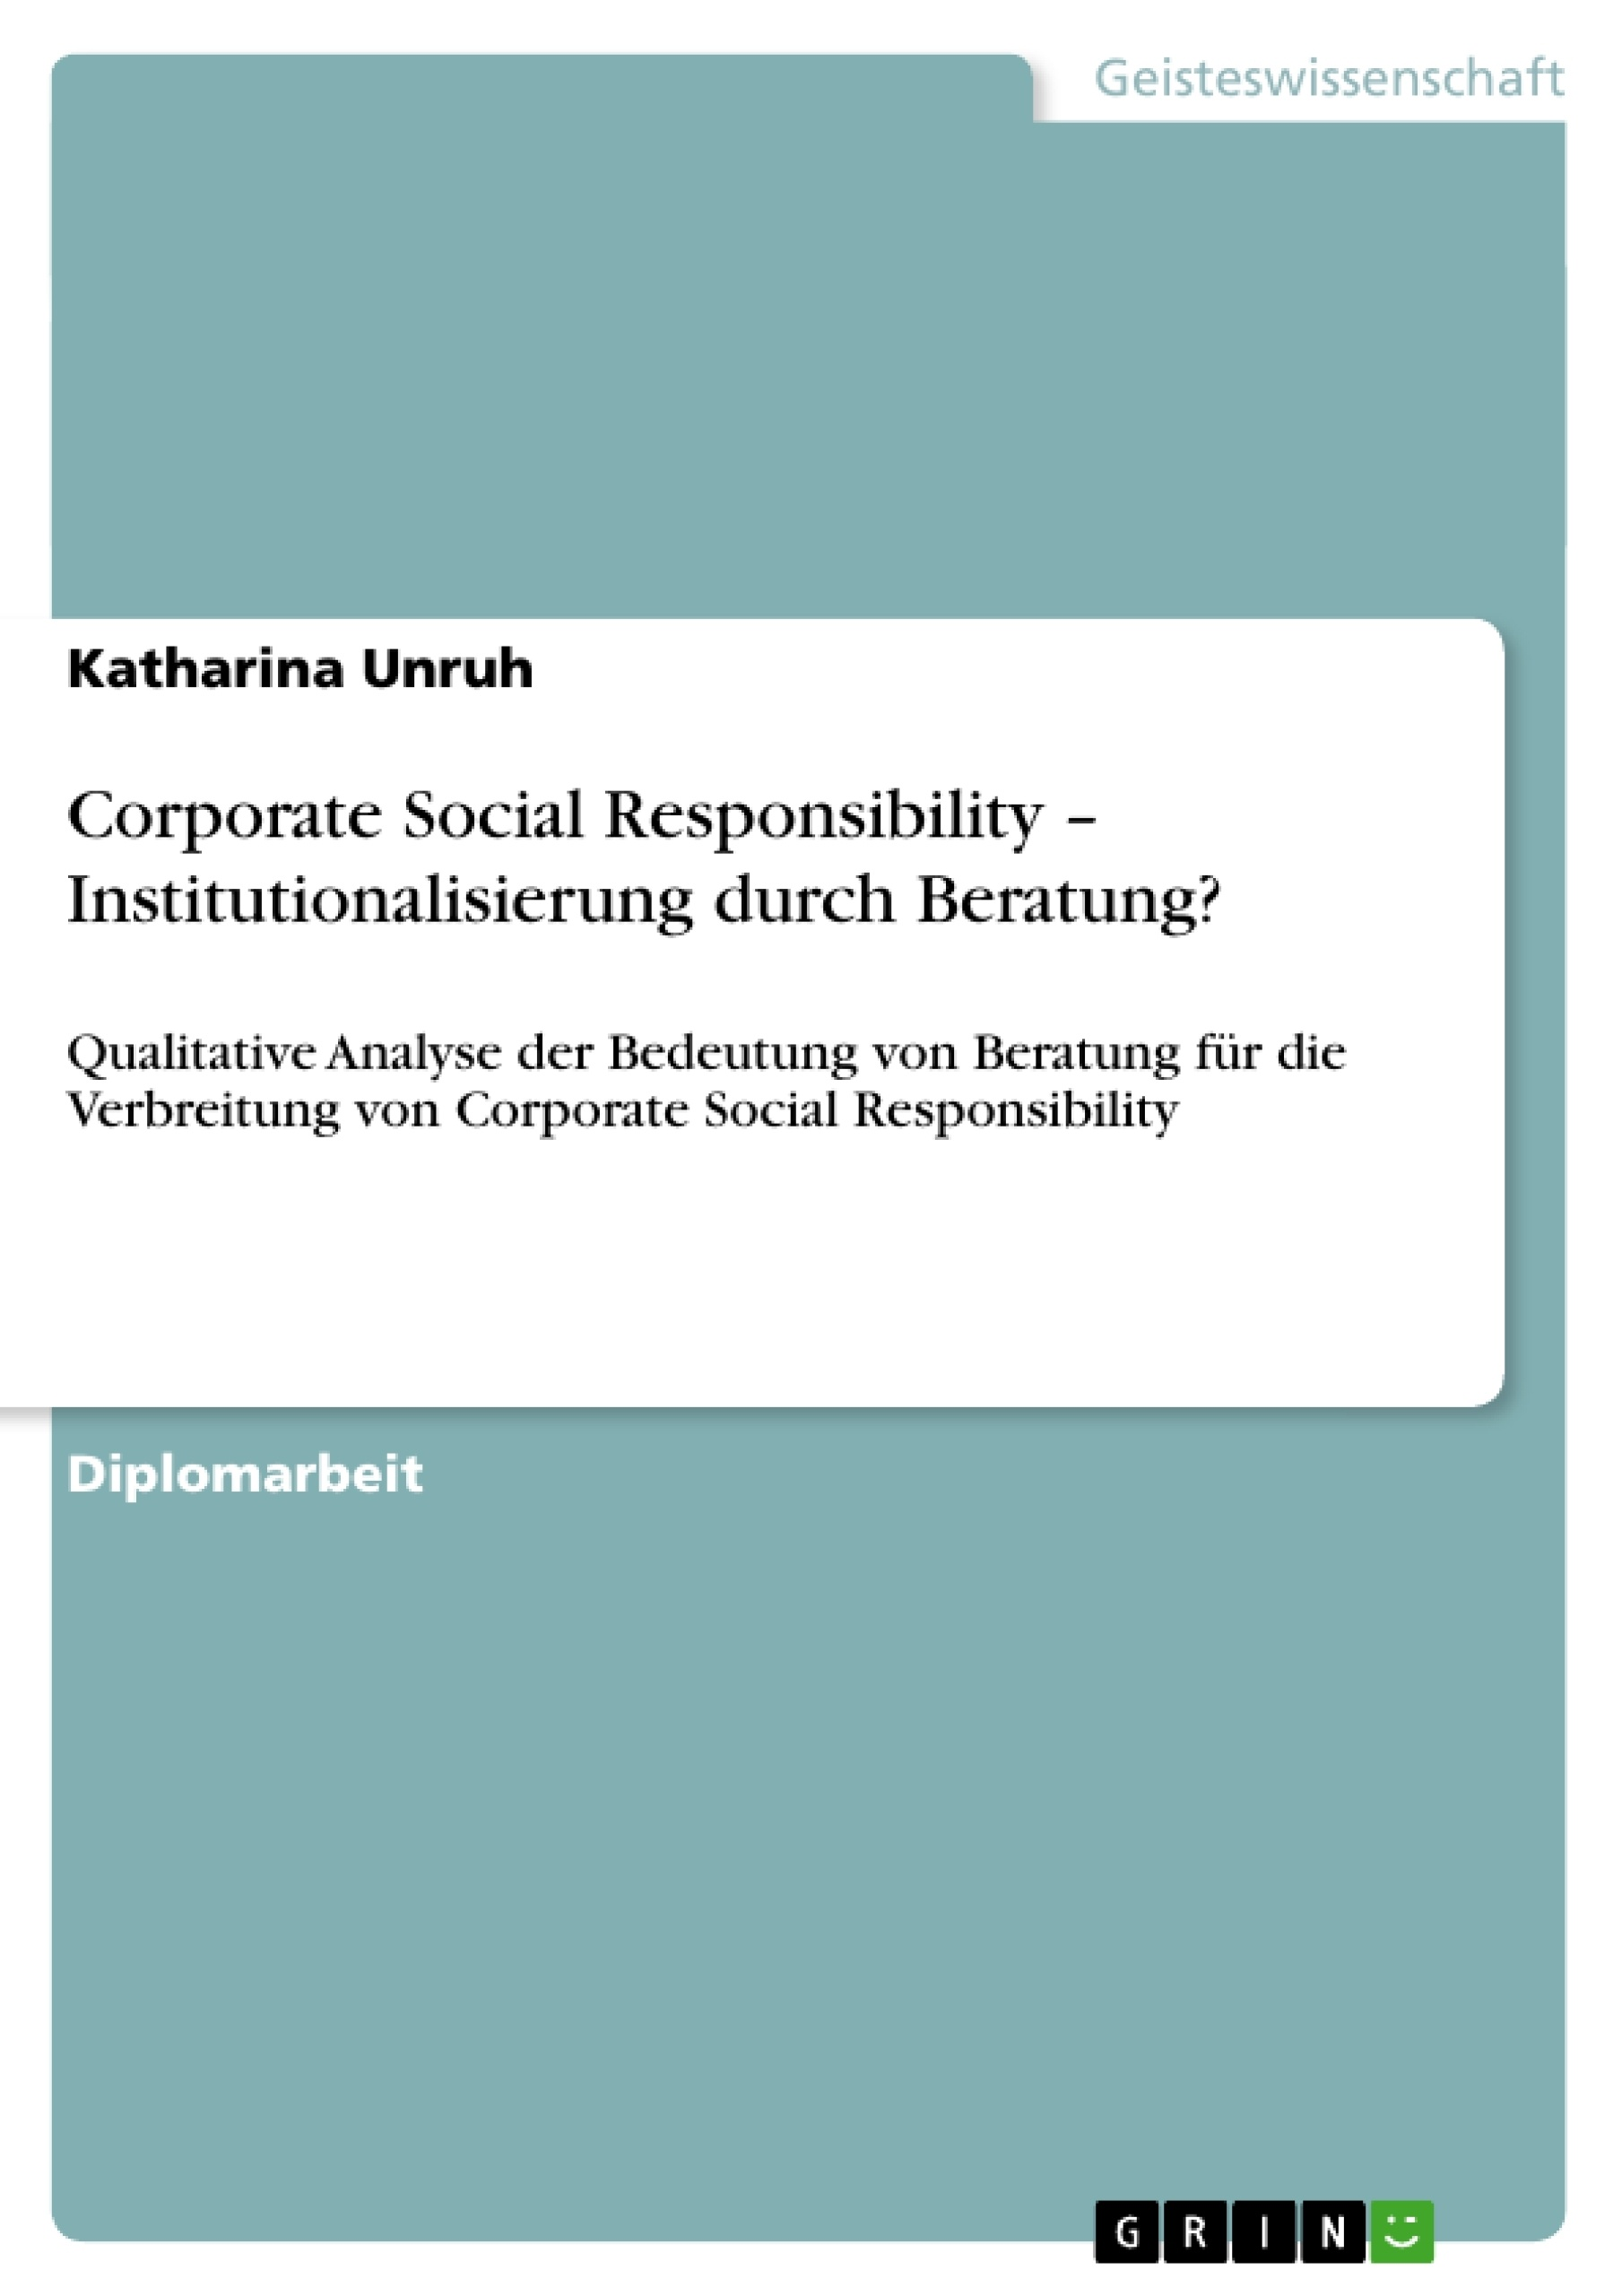 Titel: Corporate Social Responsibility – Institutionalisierung durch Beratung?